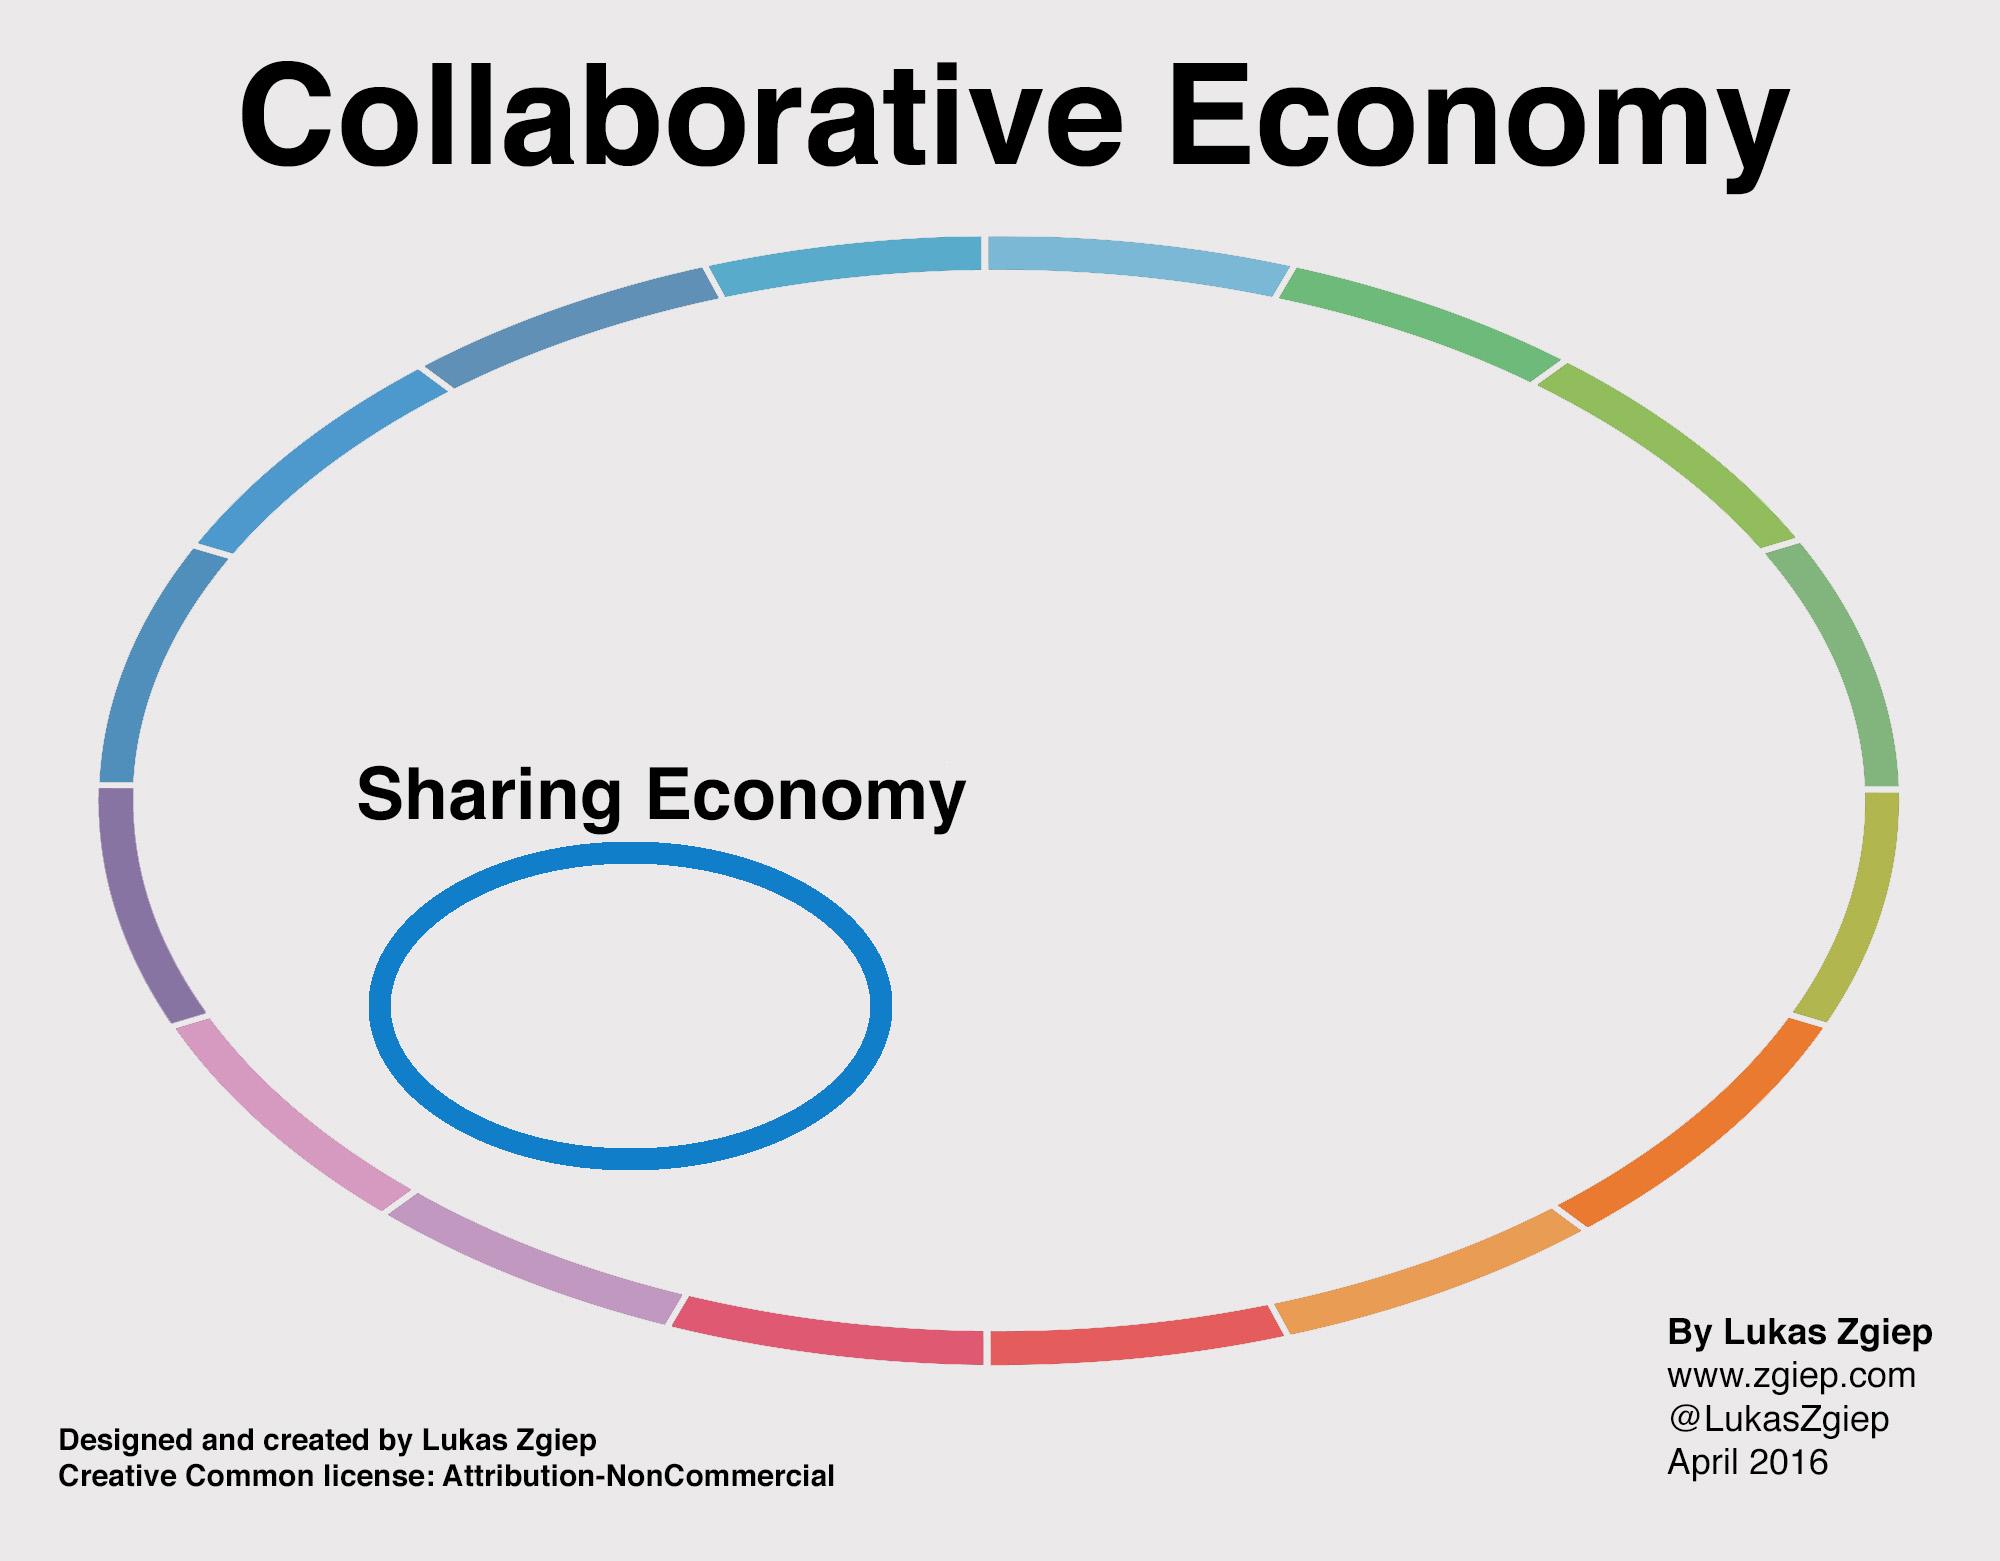 sharing vs collaborative zgiepcom